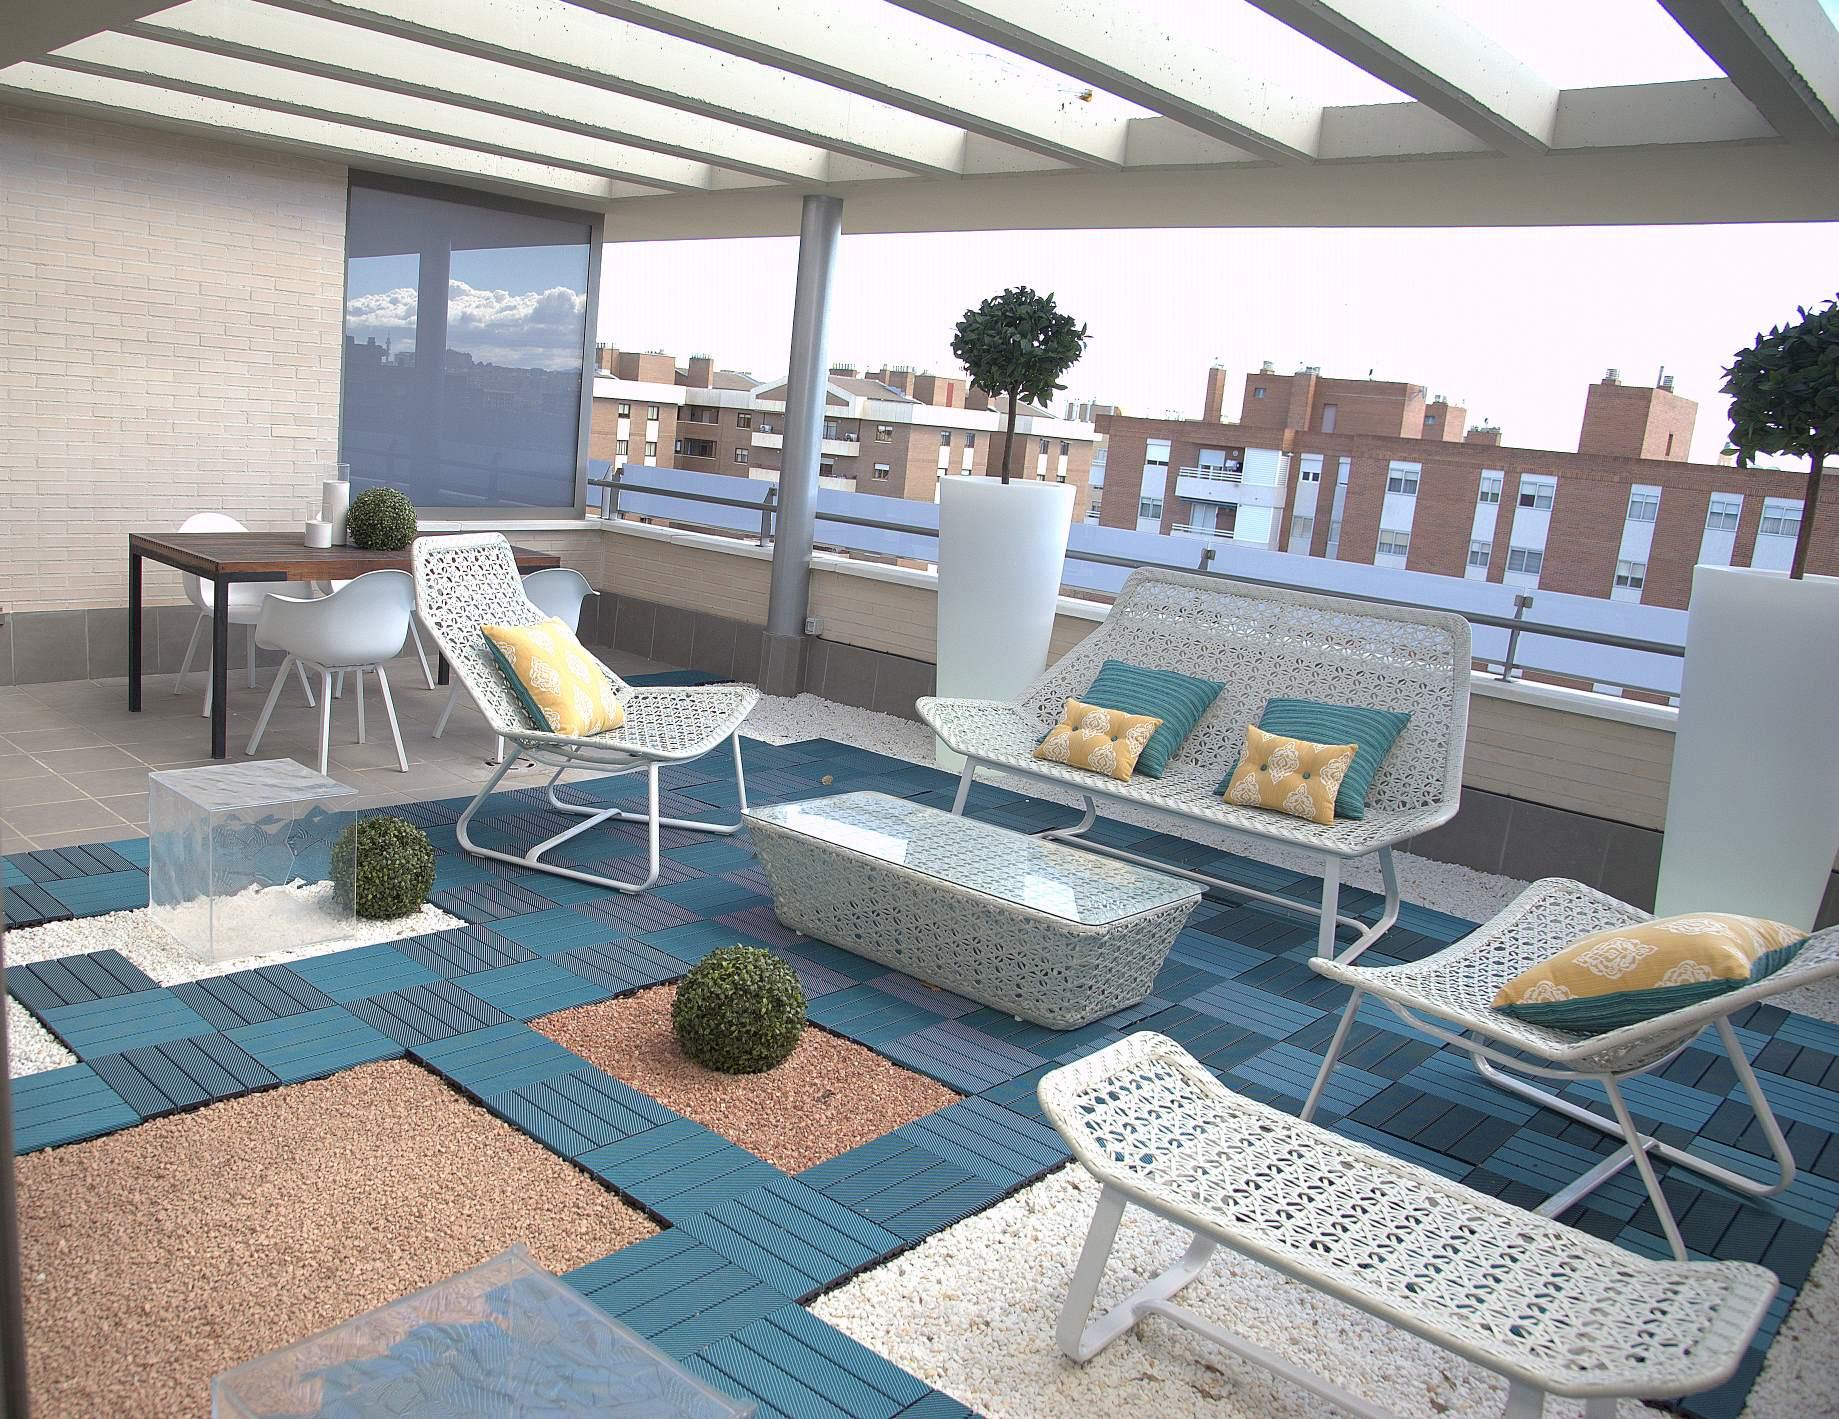 Maceteros iluminados un juego de luces en la terraza - Piscinas para terrazas aticos ...